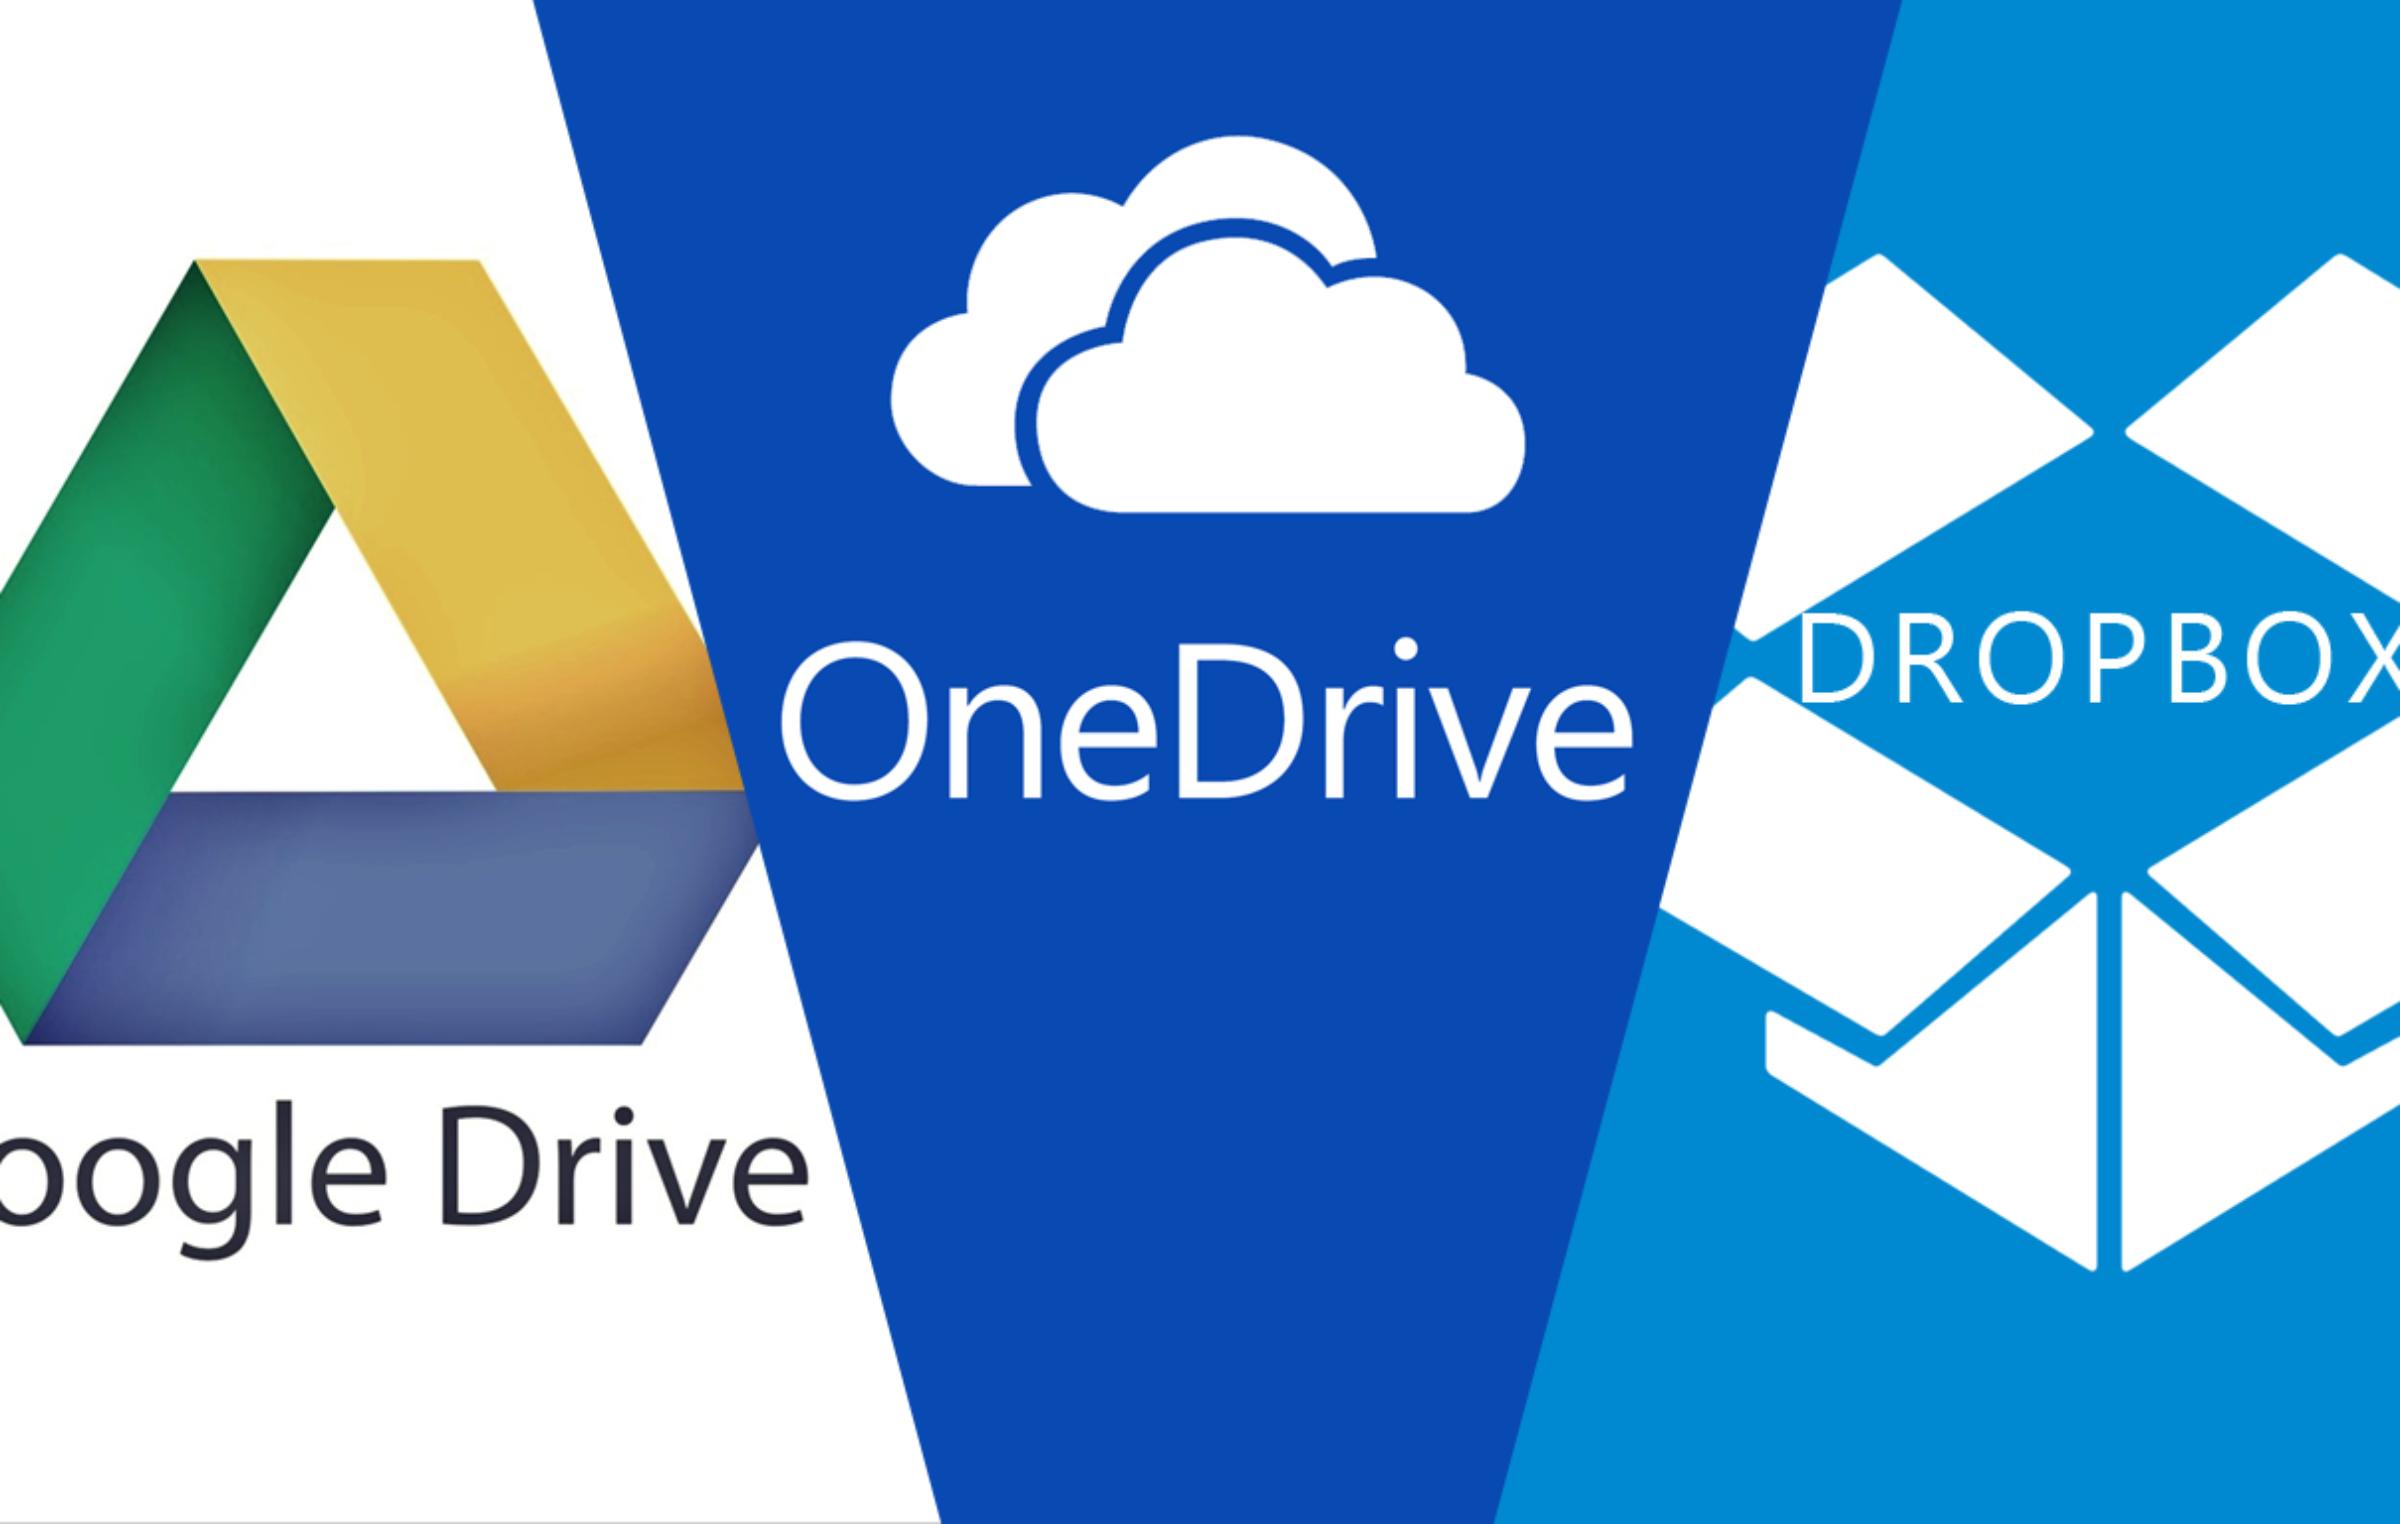 Dropbox, Google Drive, OneDrive ve GitHub'a Nasıl Girilir